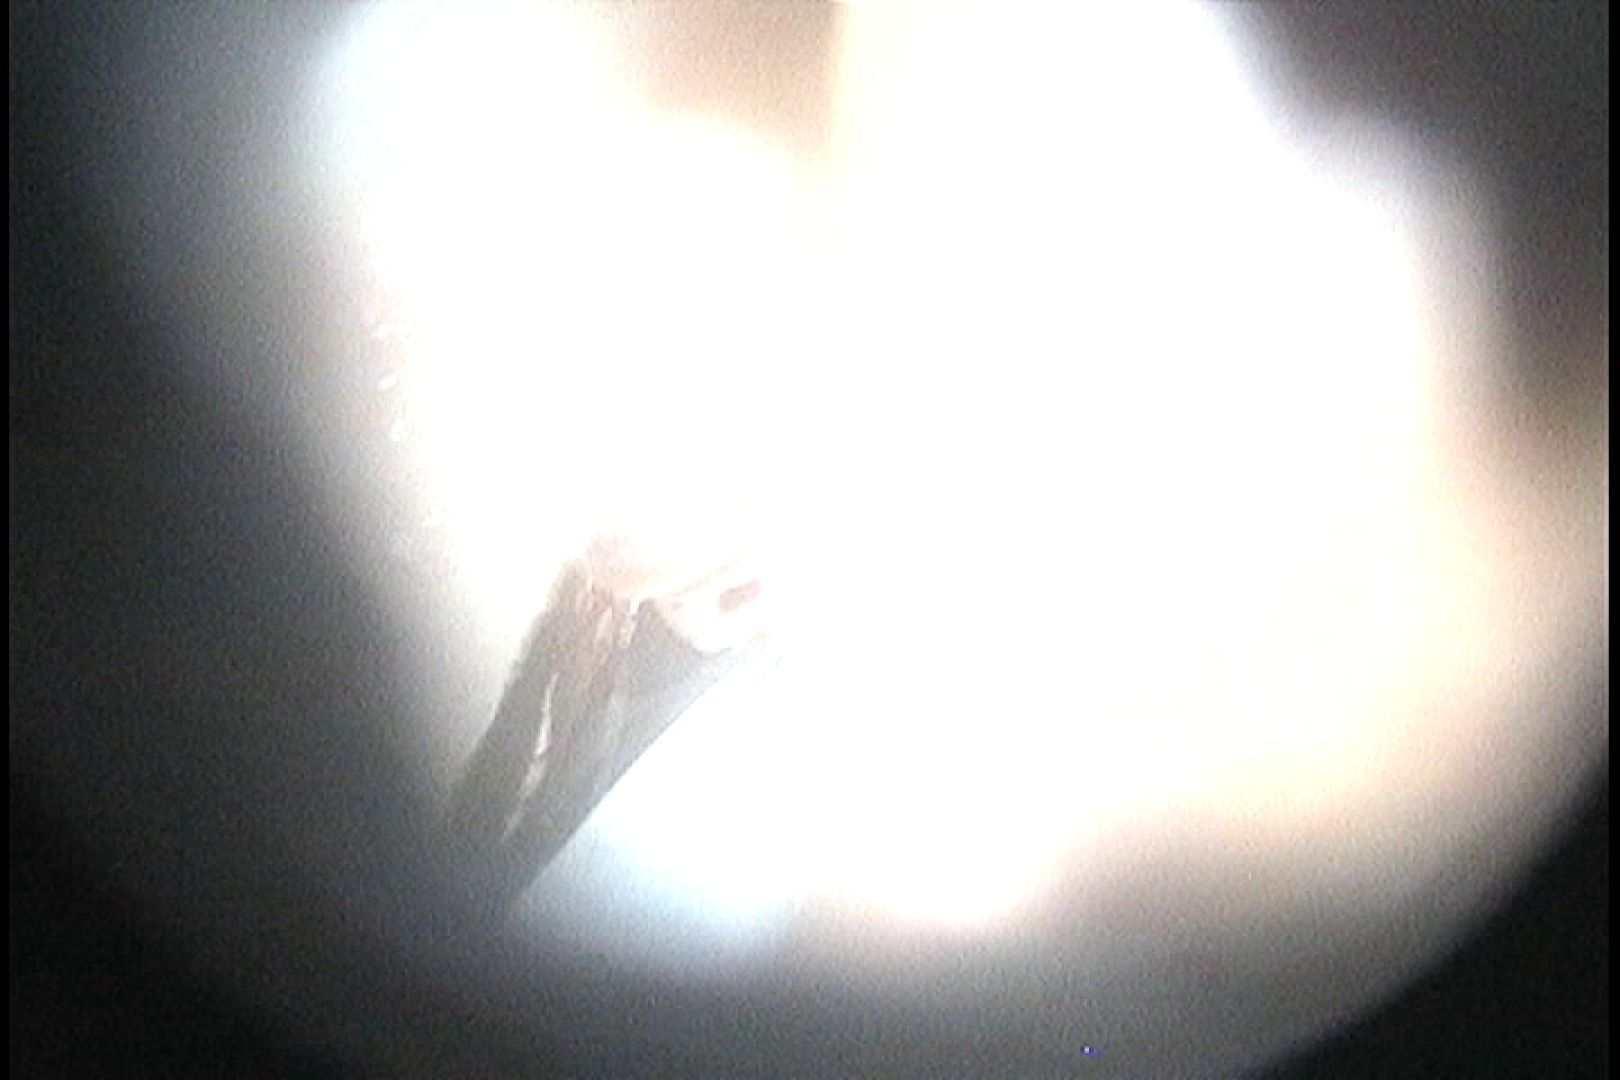 No.53 金髪ギャルの乳首に向かってズームイン 美乳 ワレメ無修正動画無料 109枚 82